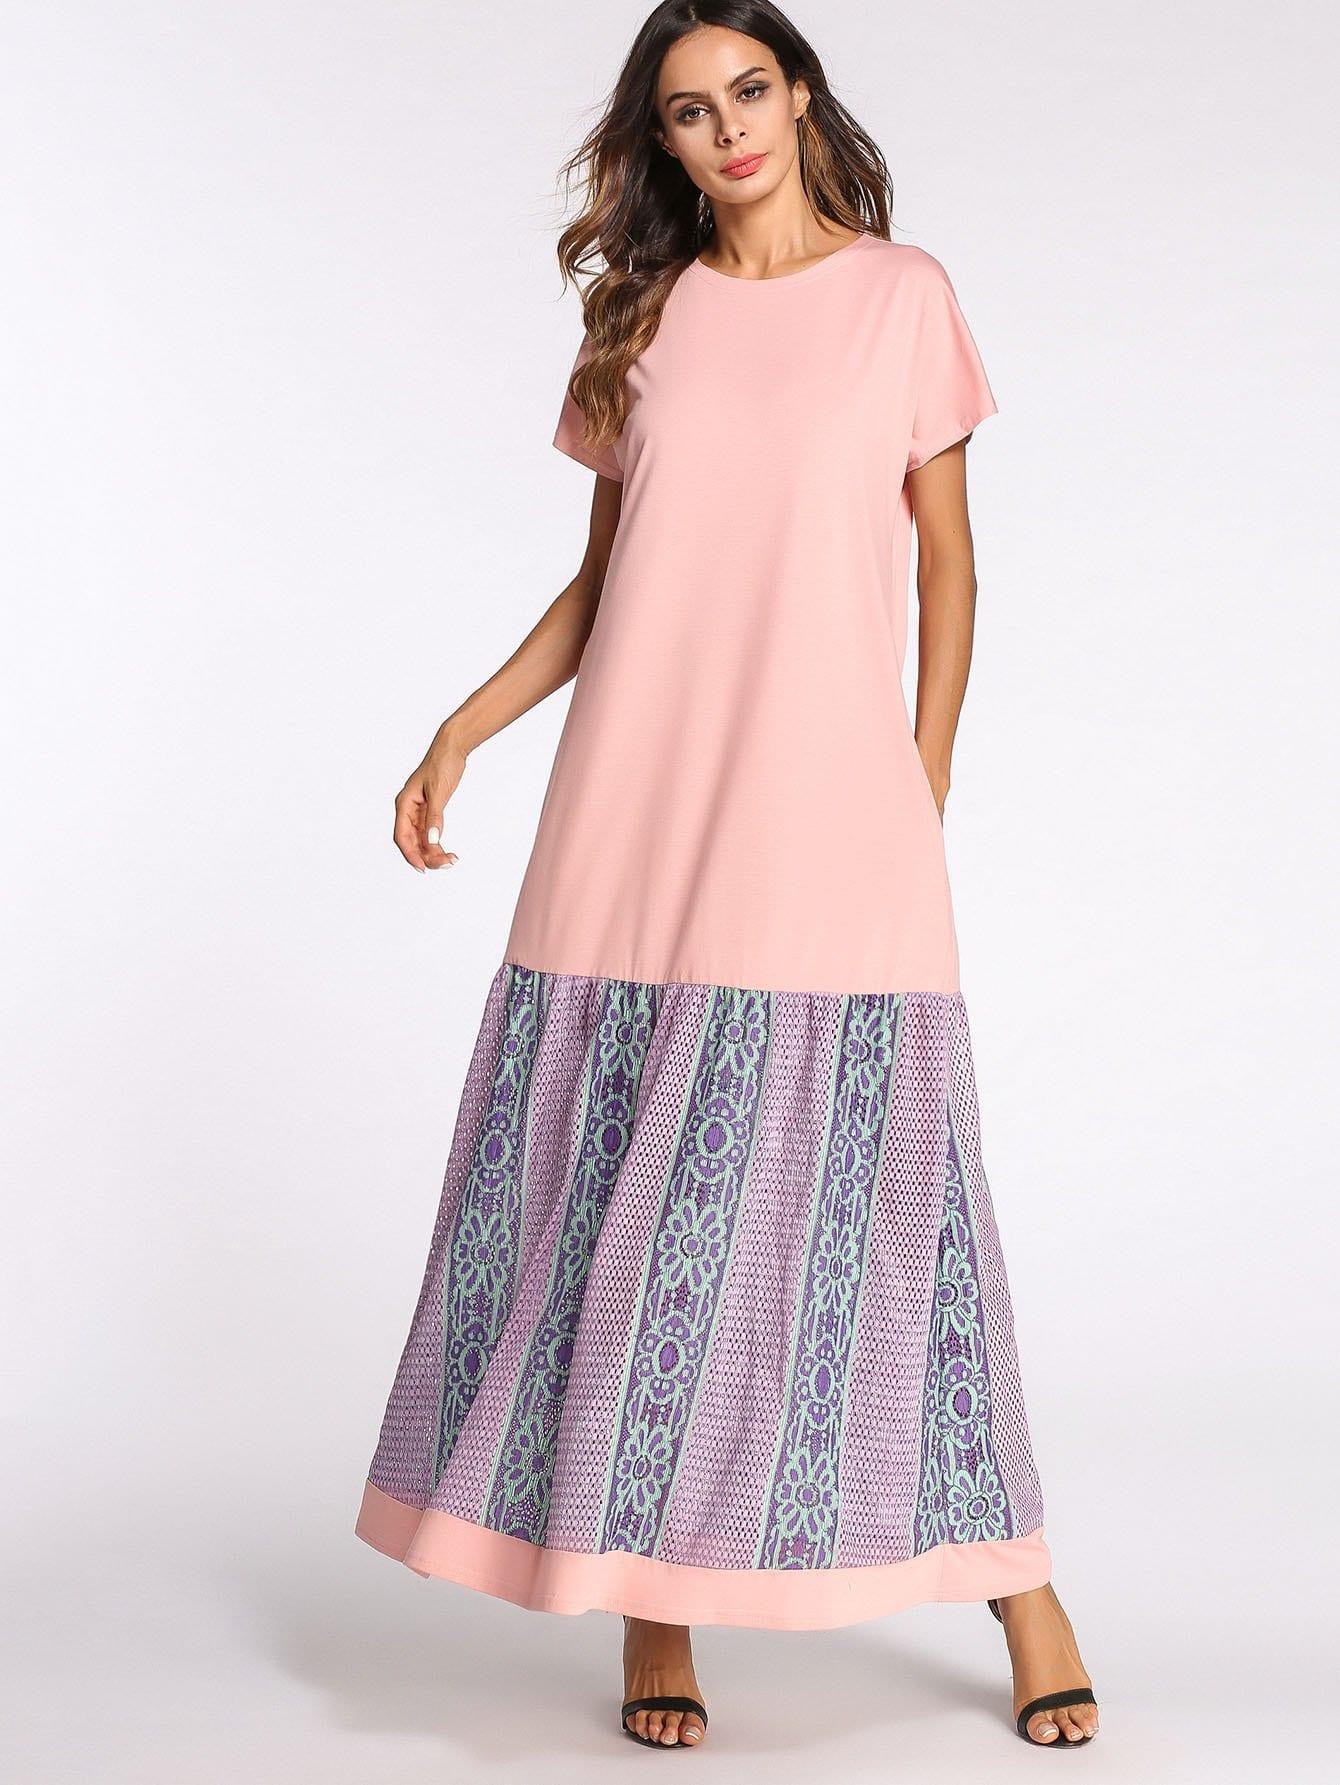 Contrast Lace Ruffle Hem Dress